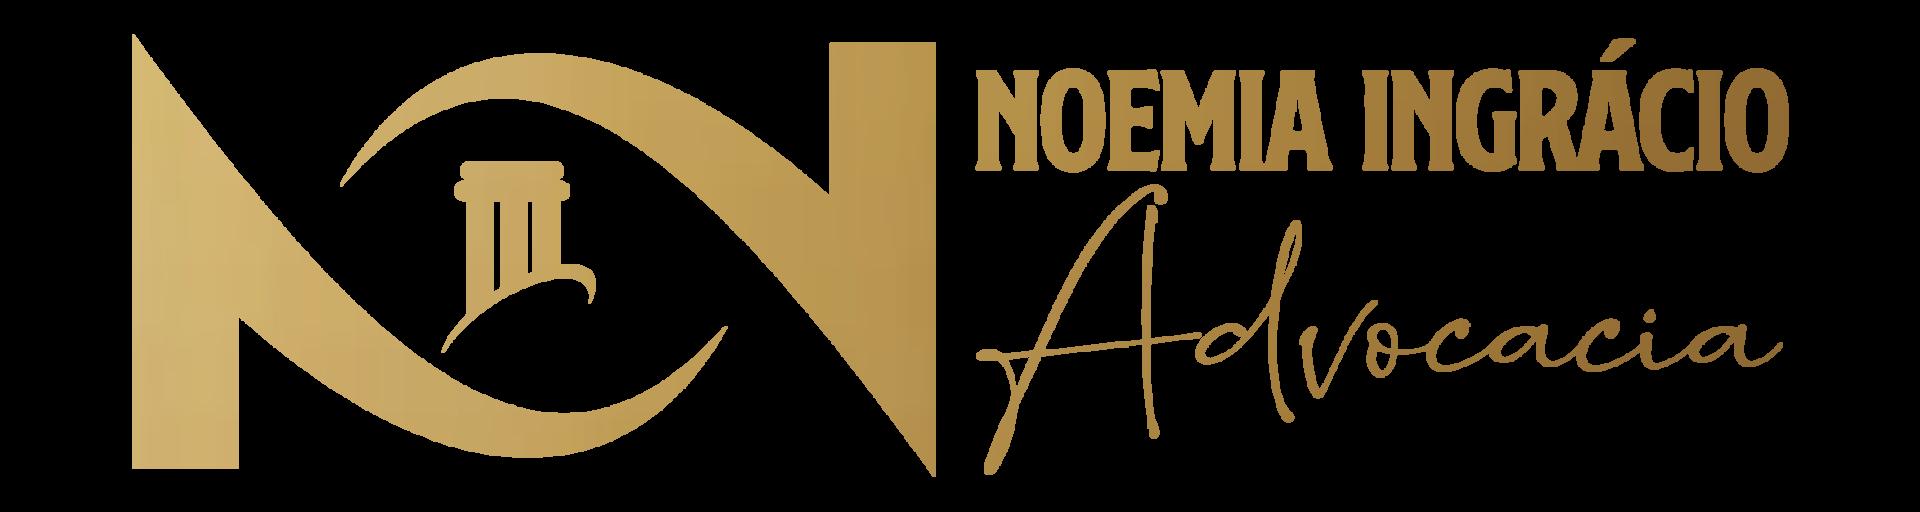 Noemia Ingracio de Silva – sociedade individual de advocacia